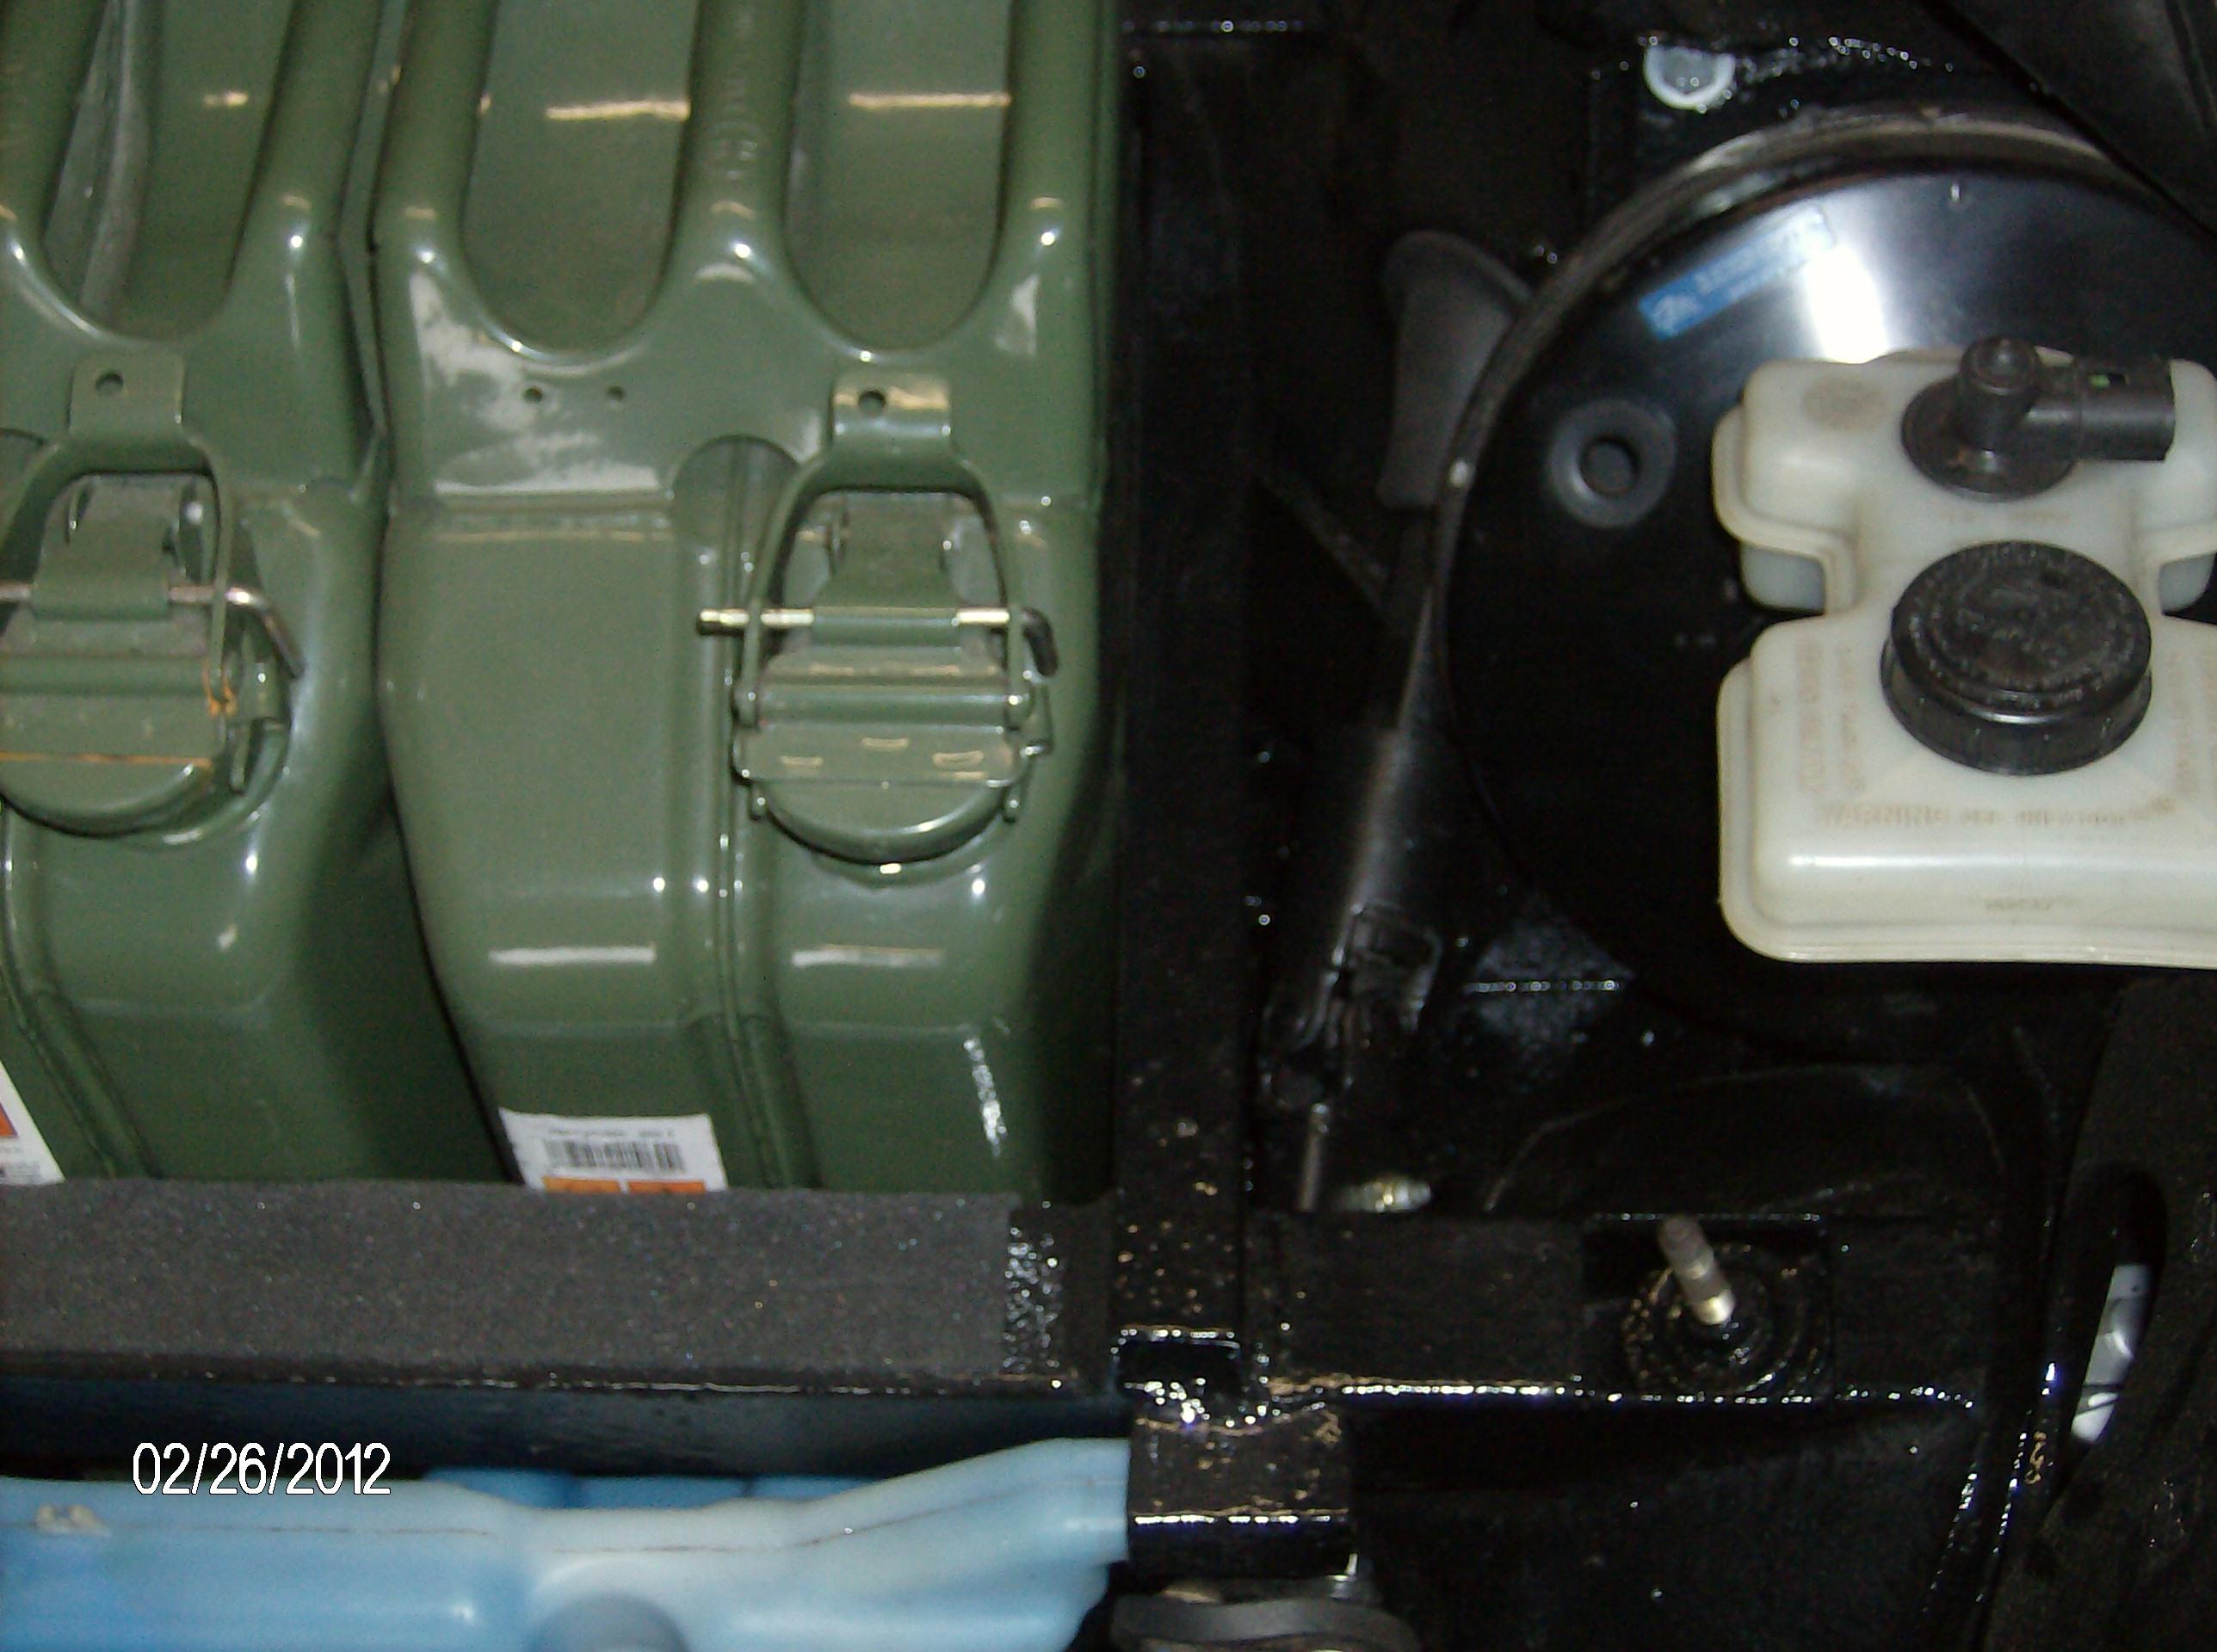 Replique renault 5 turbo - Page 6 351693HPIM2267